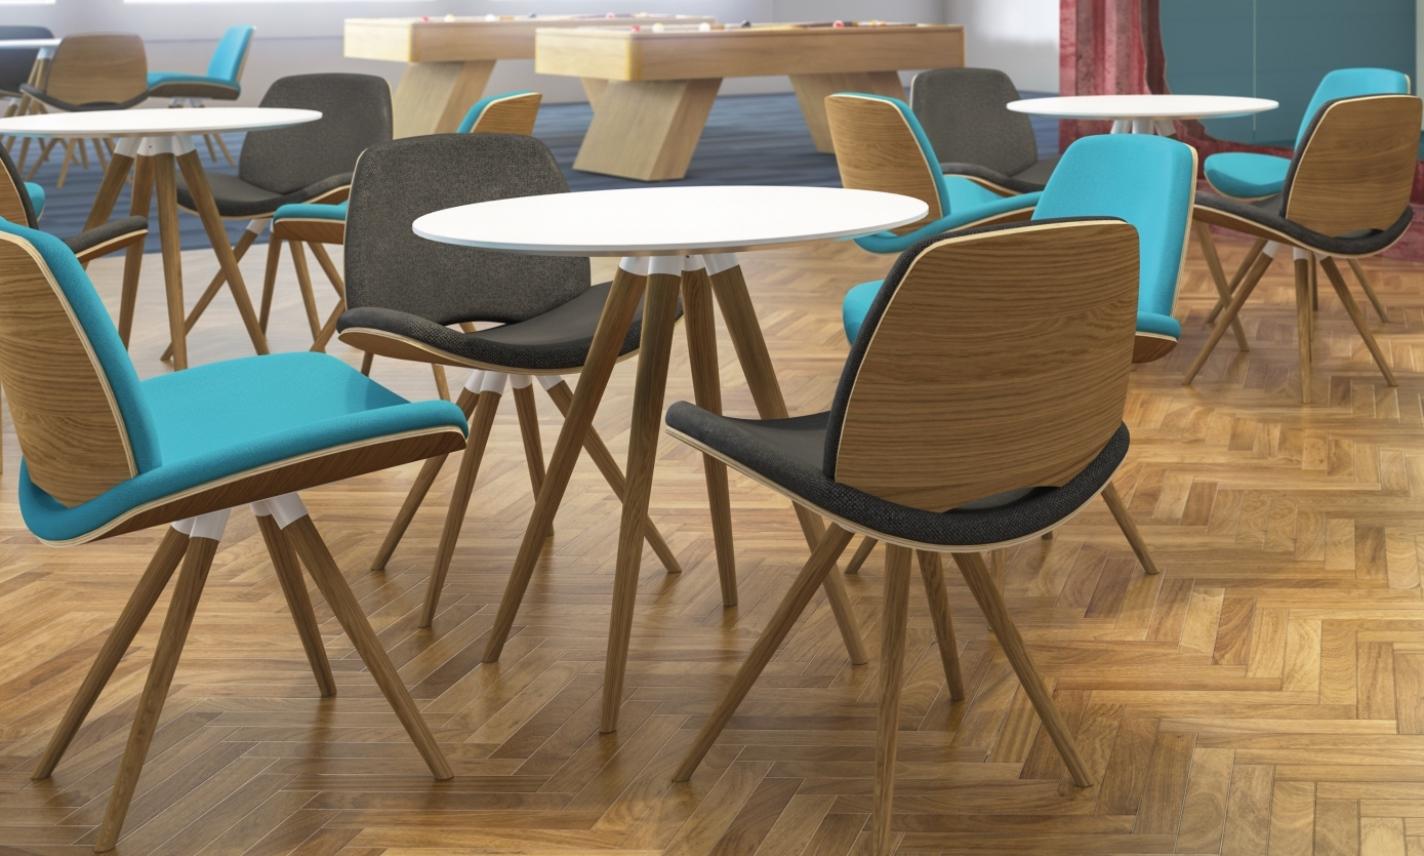 Breakout Furniture - Era Wood - Breakout Seating - Breakout Tables